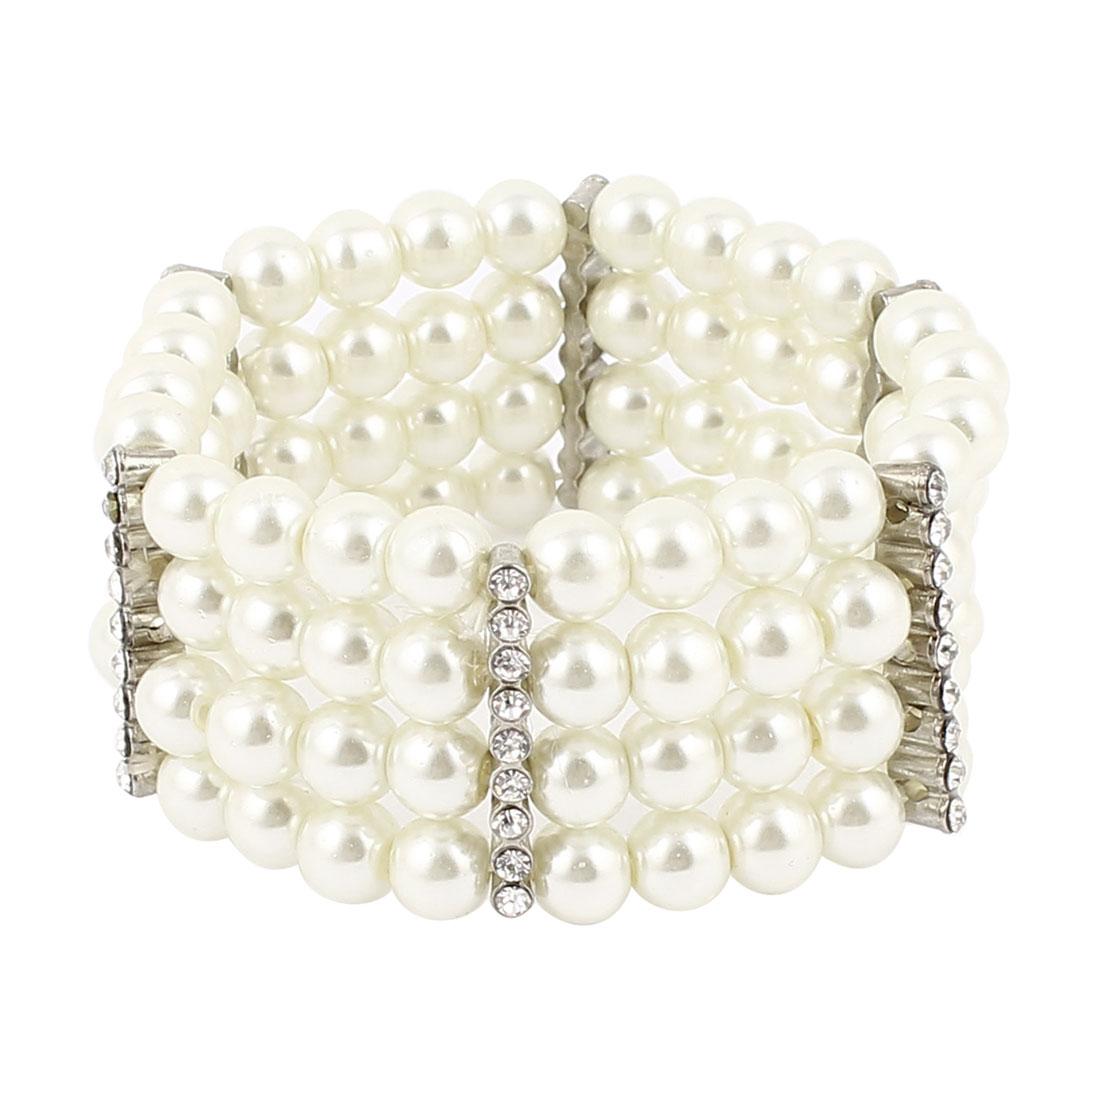 Lady White 4 Row Faux Pearl Beads Rhinestone Detailing Elastic String Bracelet Bangle